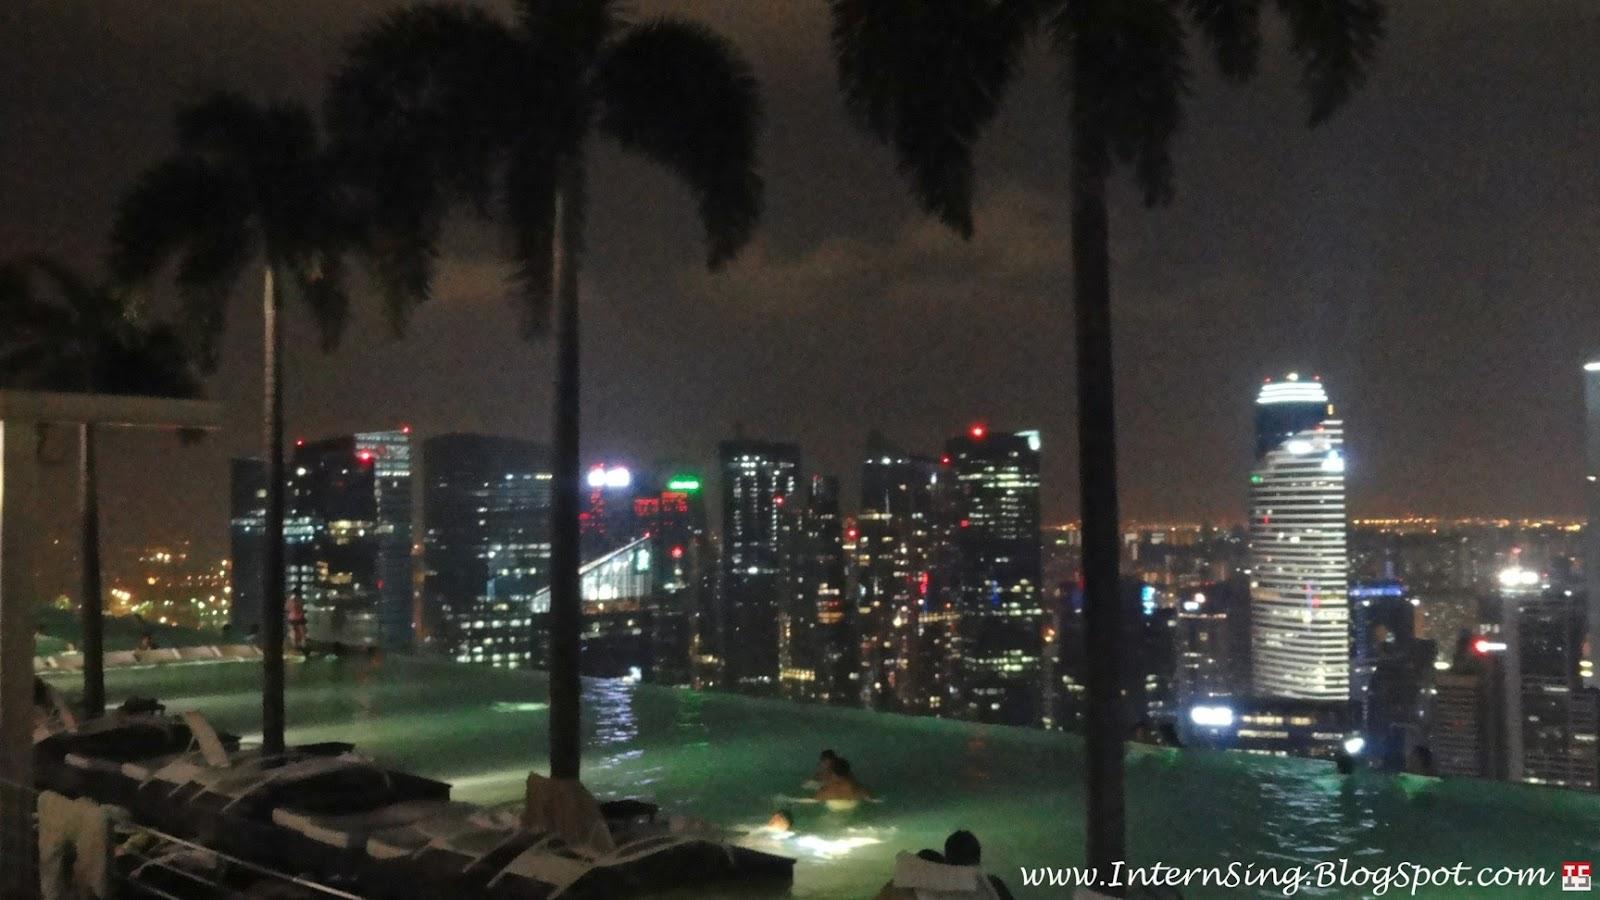 Préférence InternSing: Marina Bay Sands et son chocolate barhuuuuuuuuum FE99